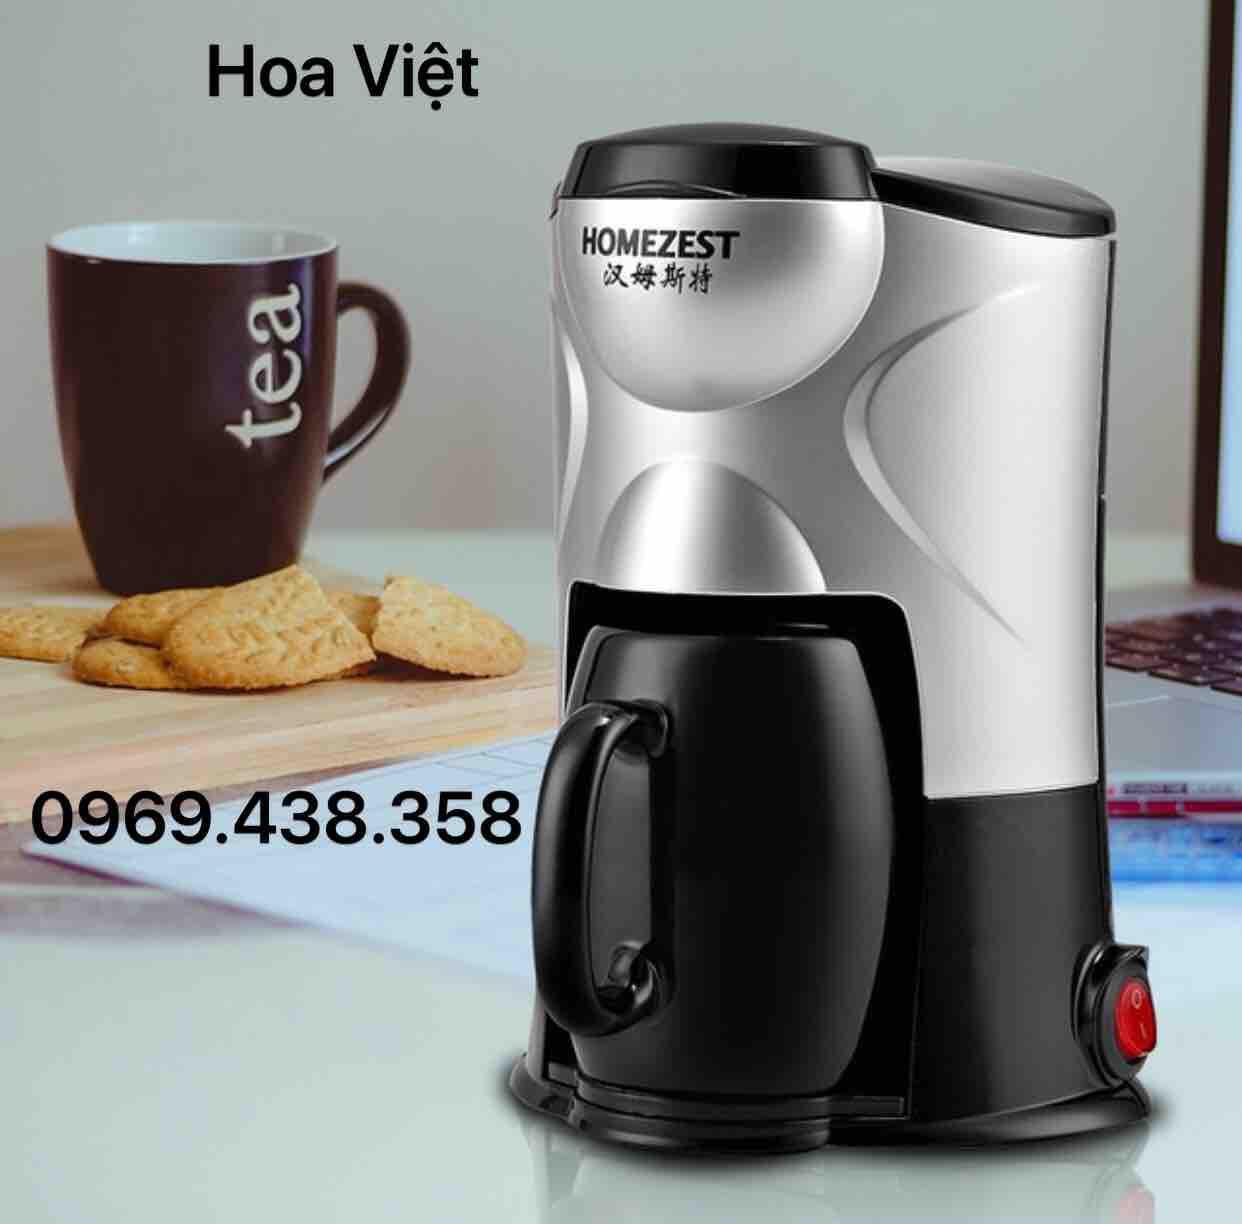 Máy pha cà phê Homezest